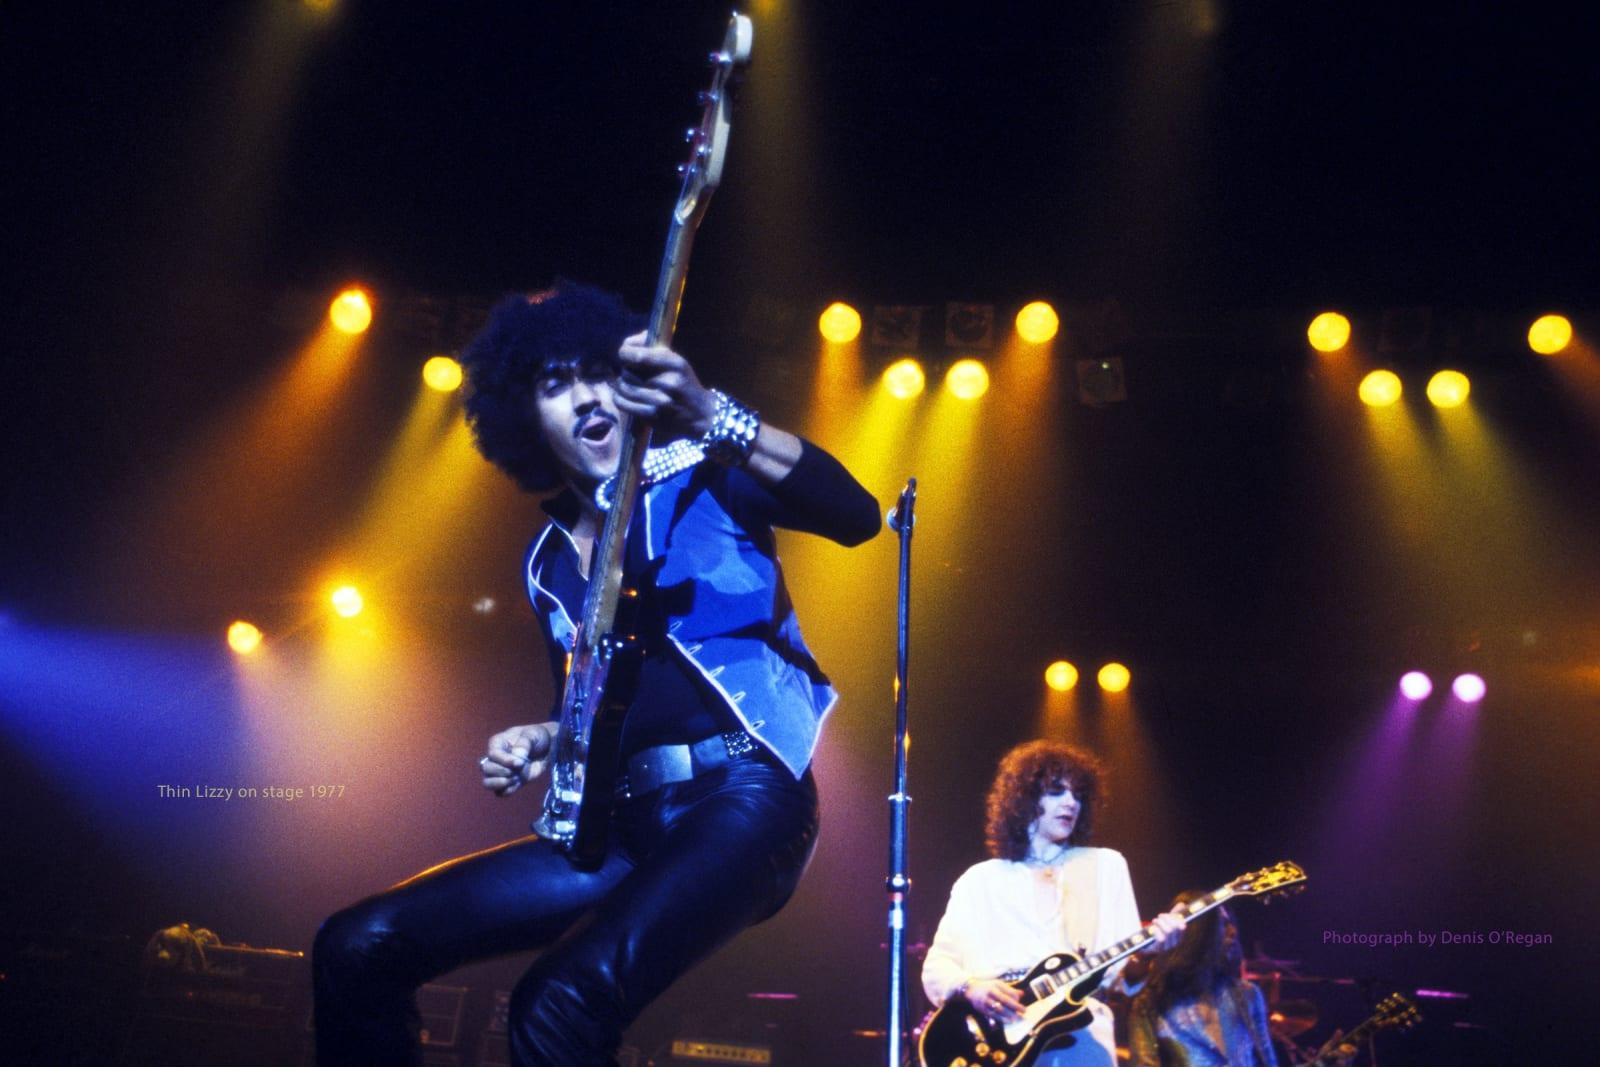 THIN LIZZY, Phil Lynott & Brian Robertson, 1977